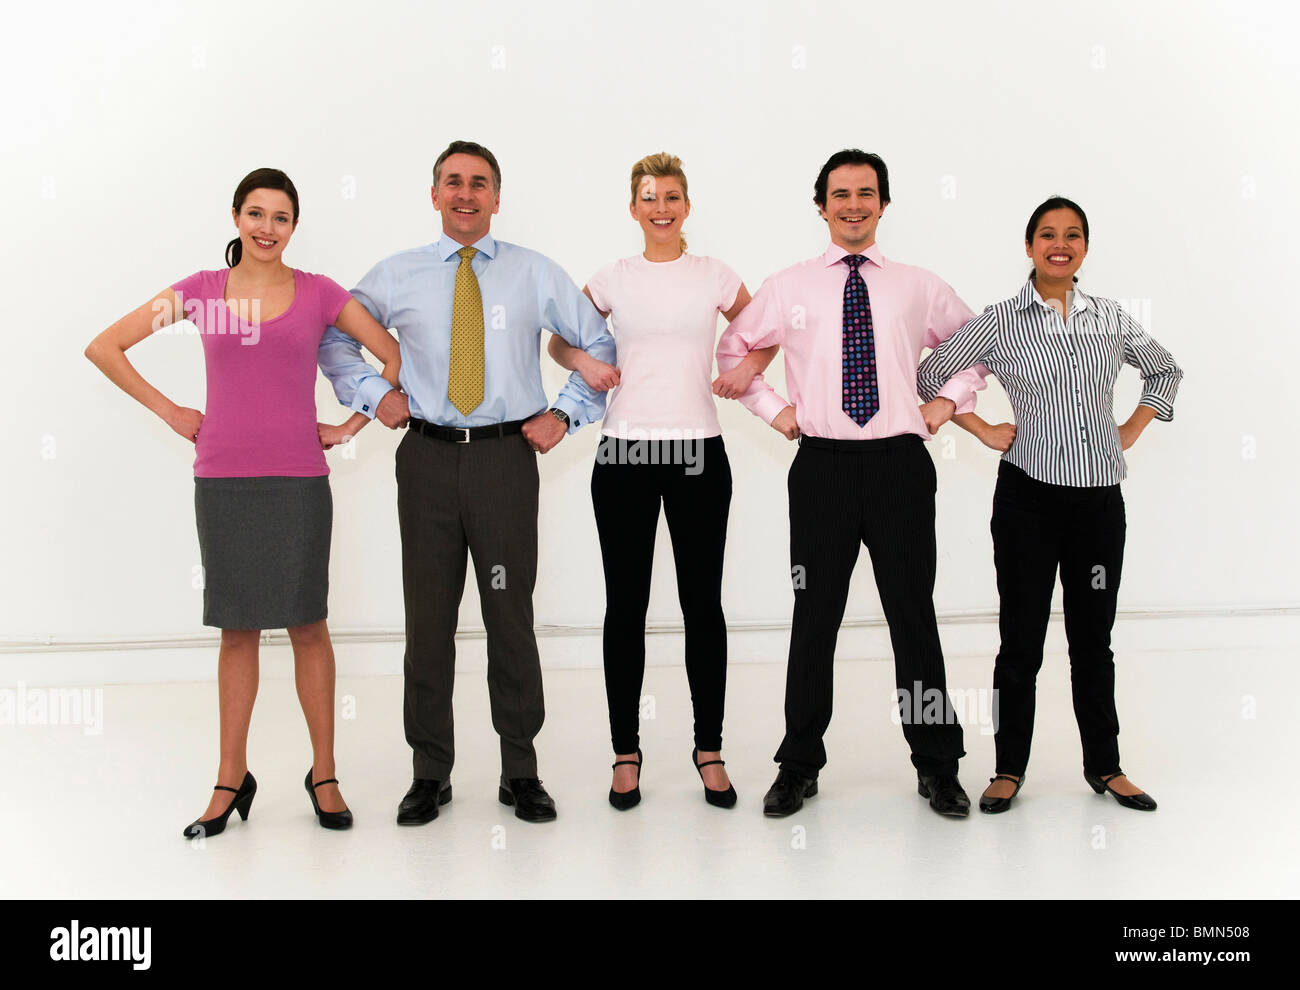 Confident business team united - Stock Image